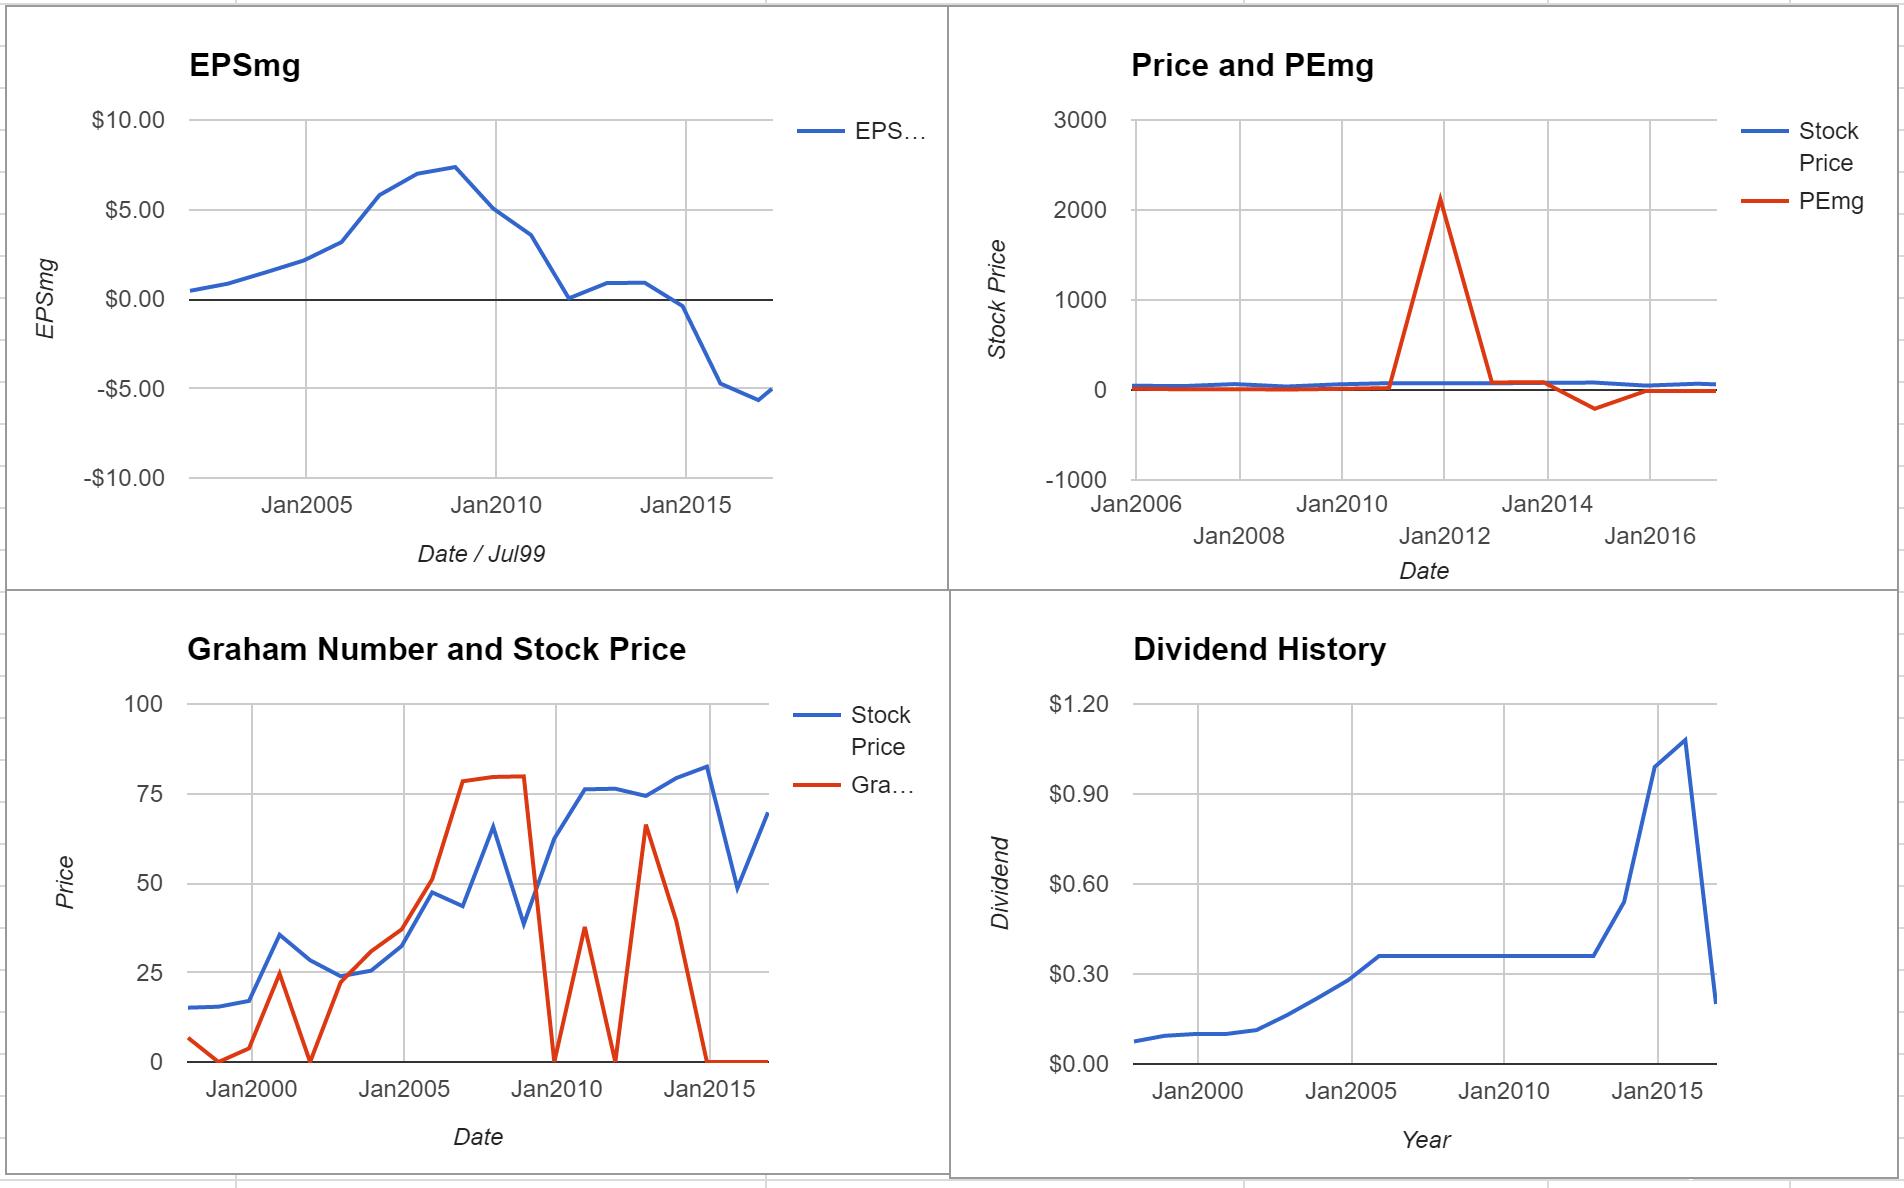 Anadarko Petroleum Co Valuation – April 2017 $APC